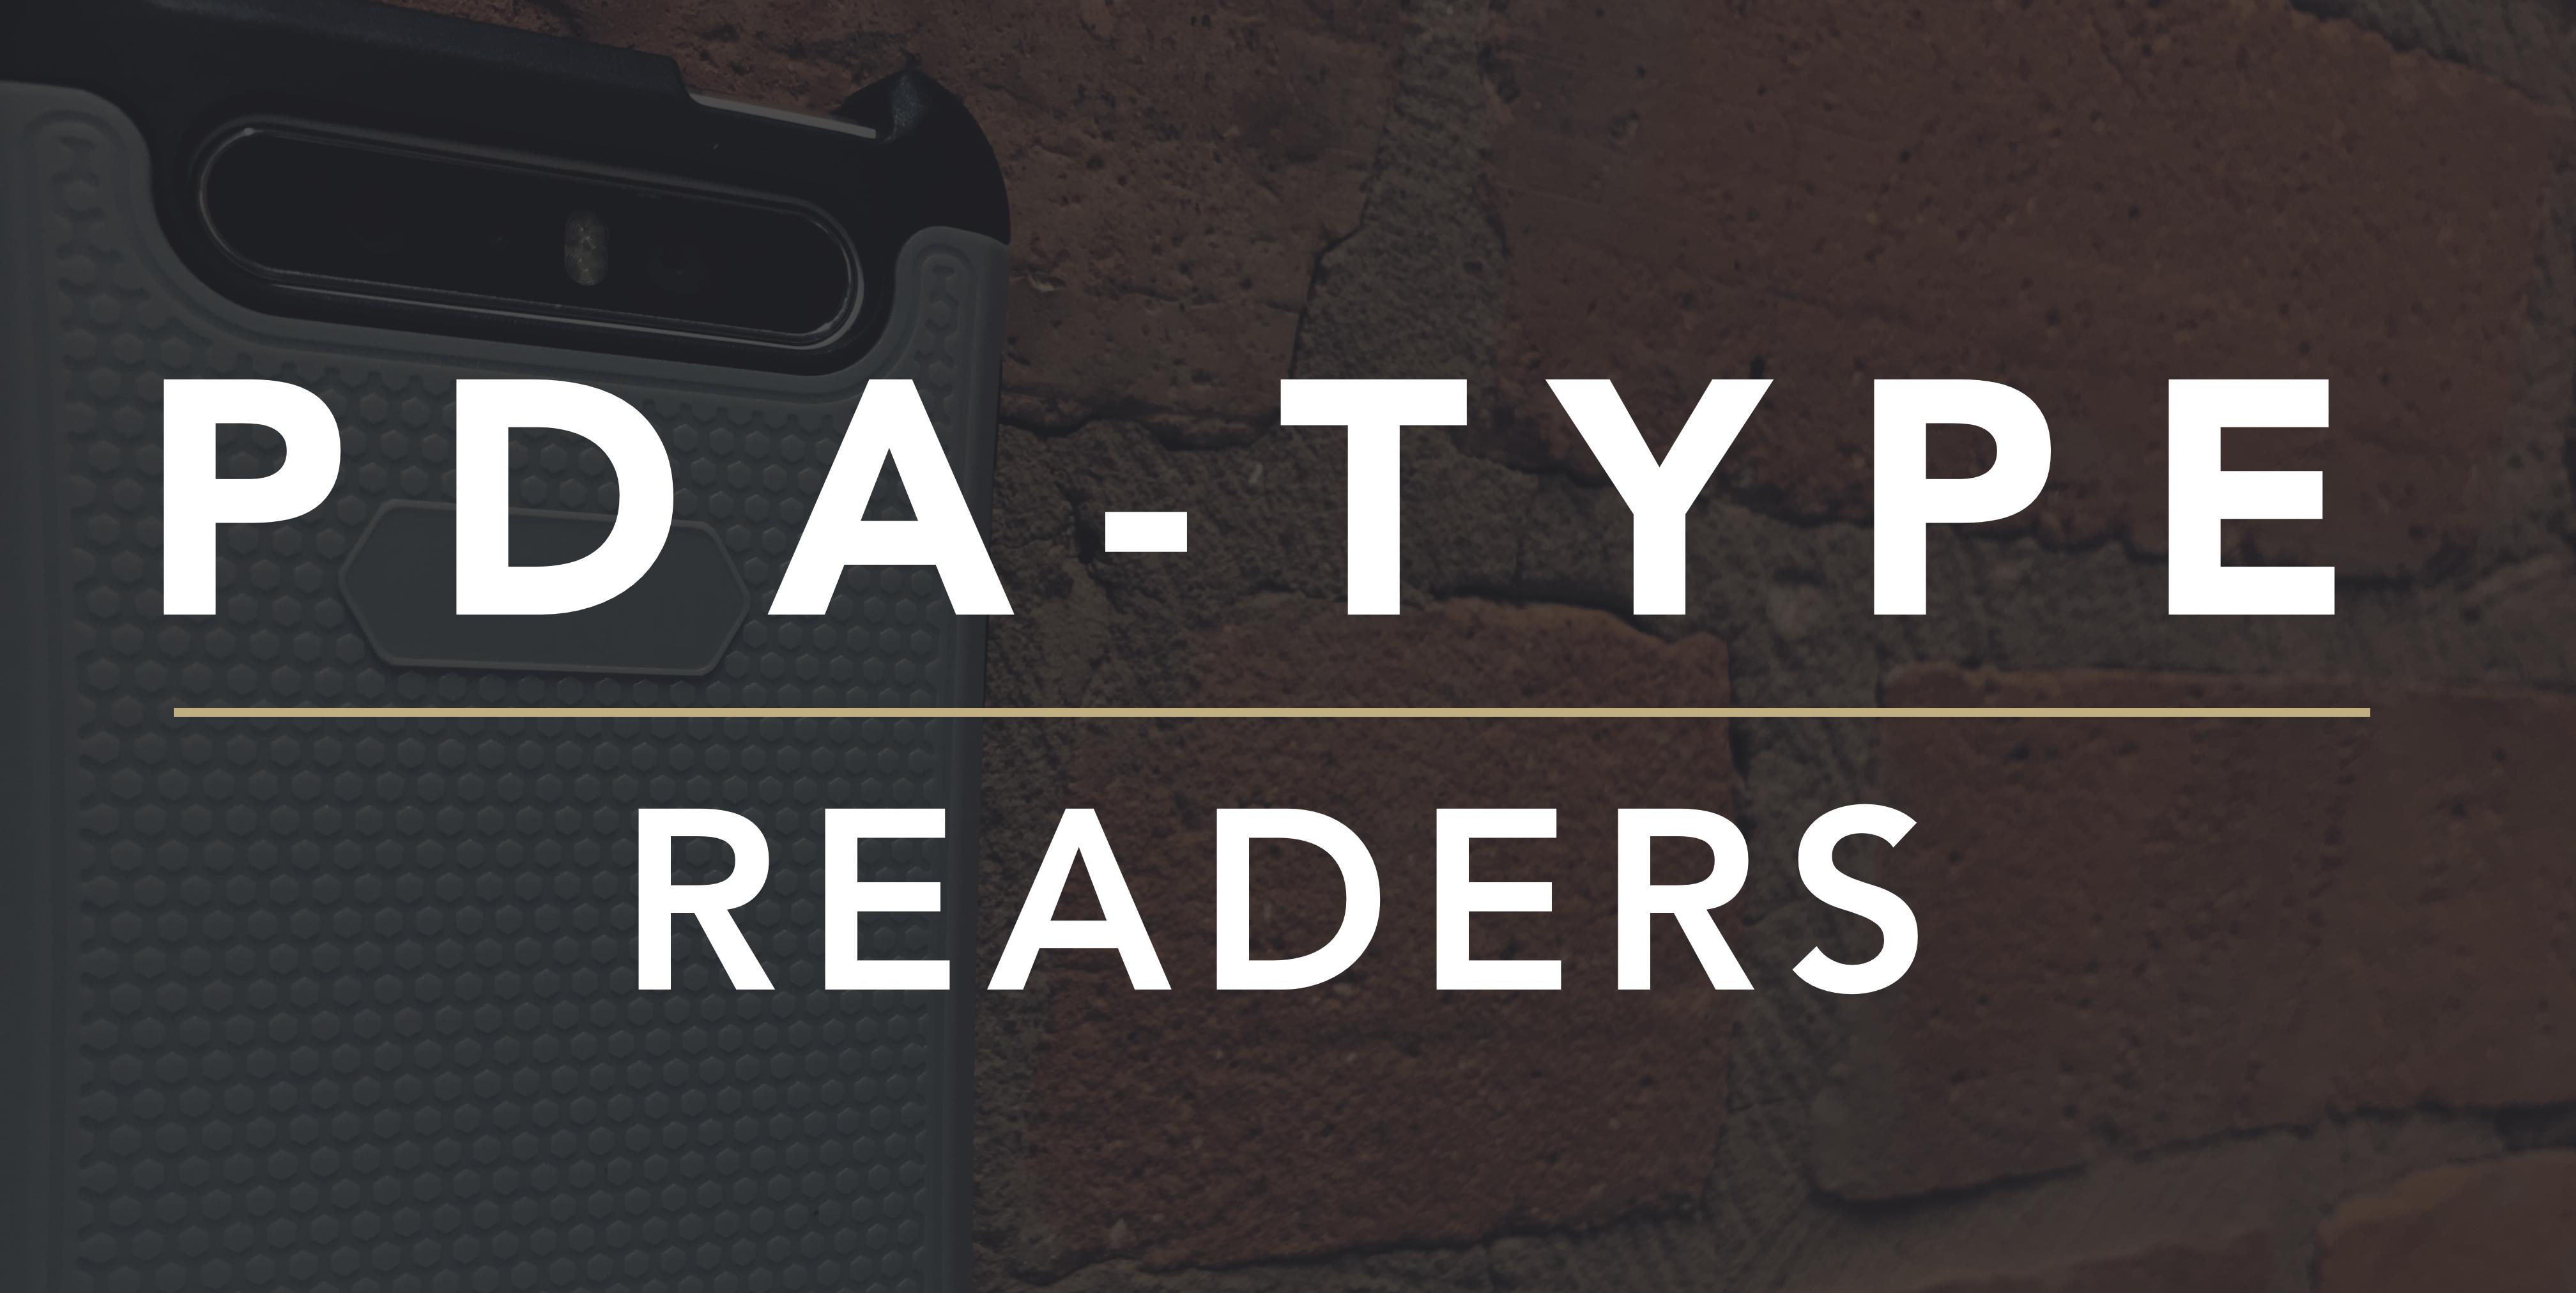 PDA TYPE READERS